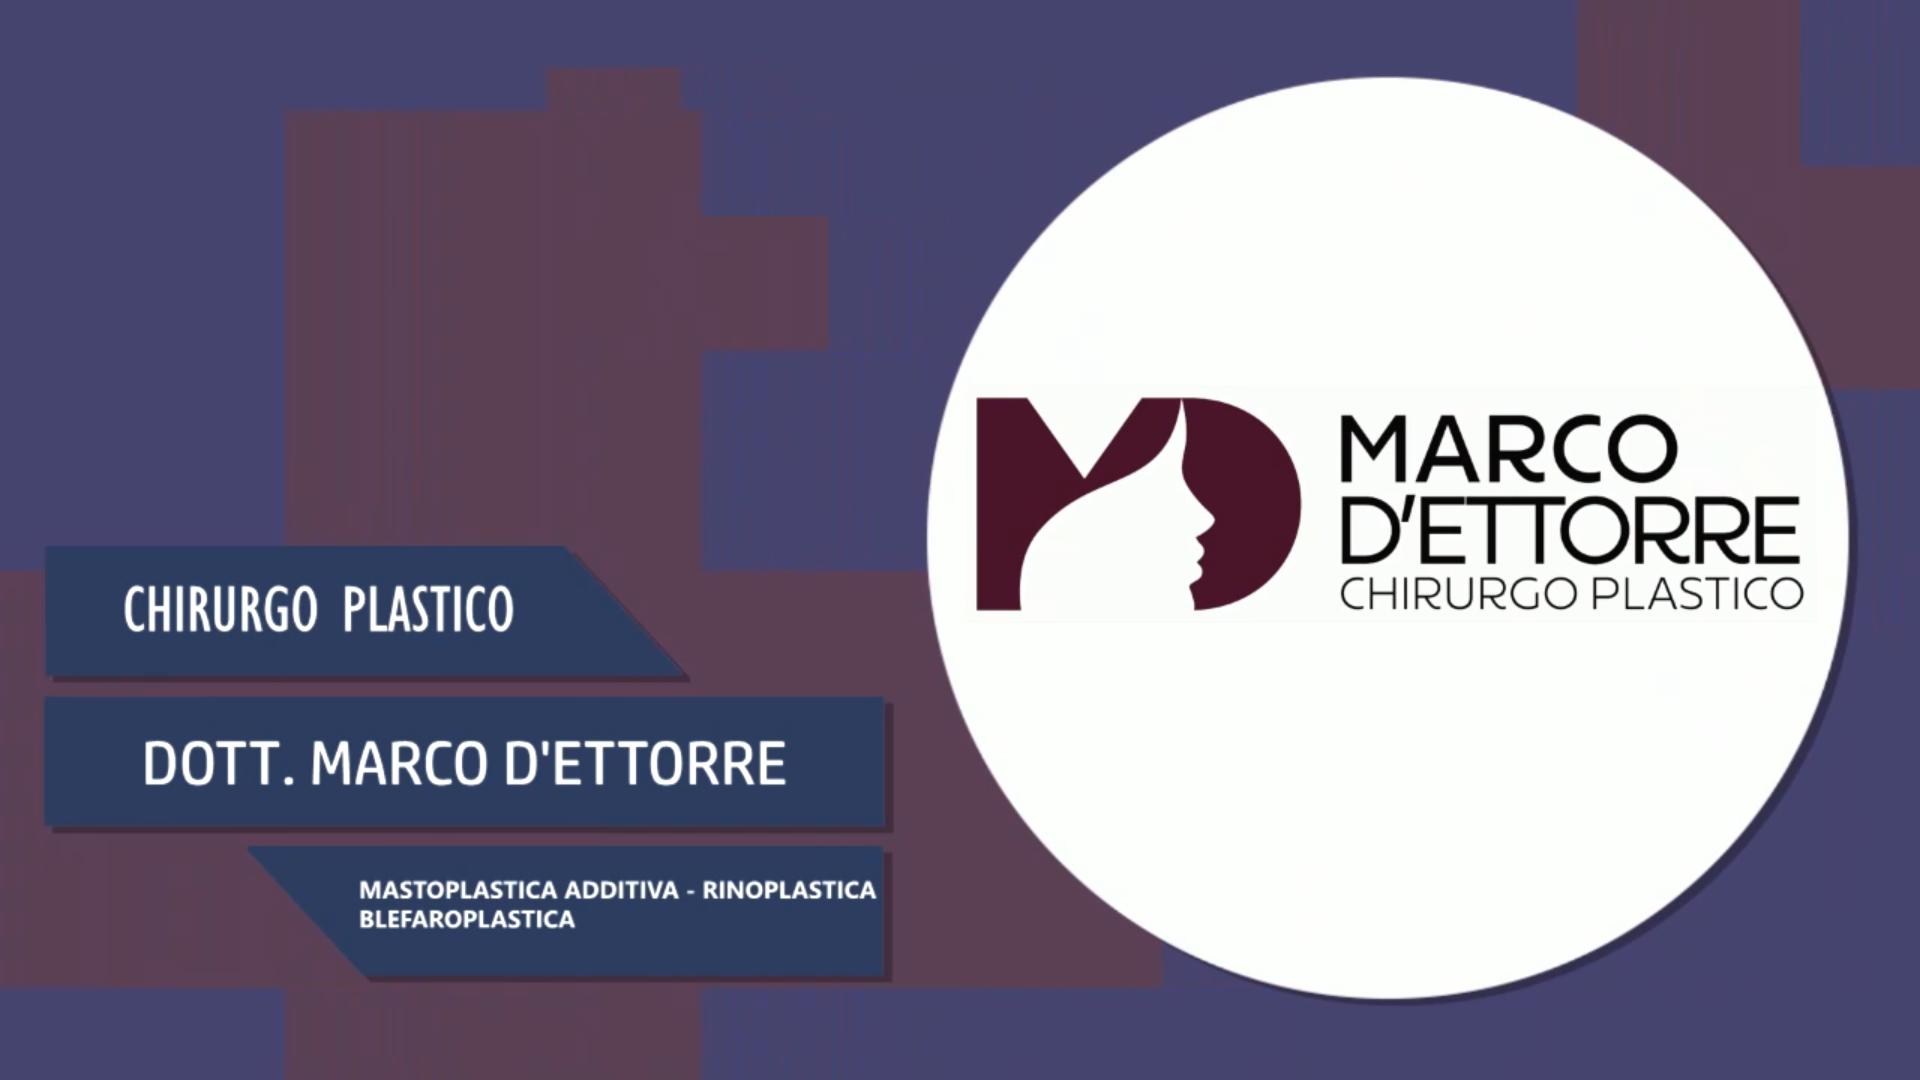 Intervista al Dott. Marco D'Ettorre